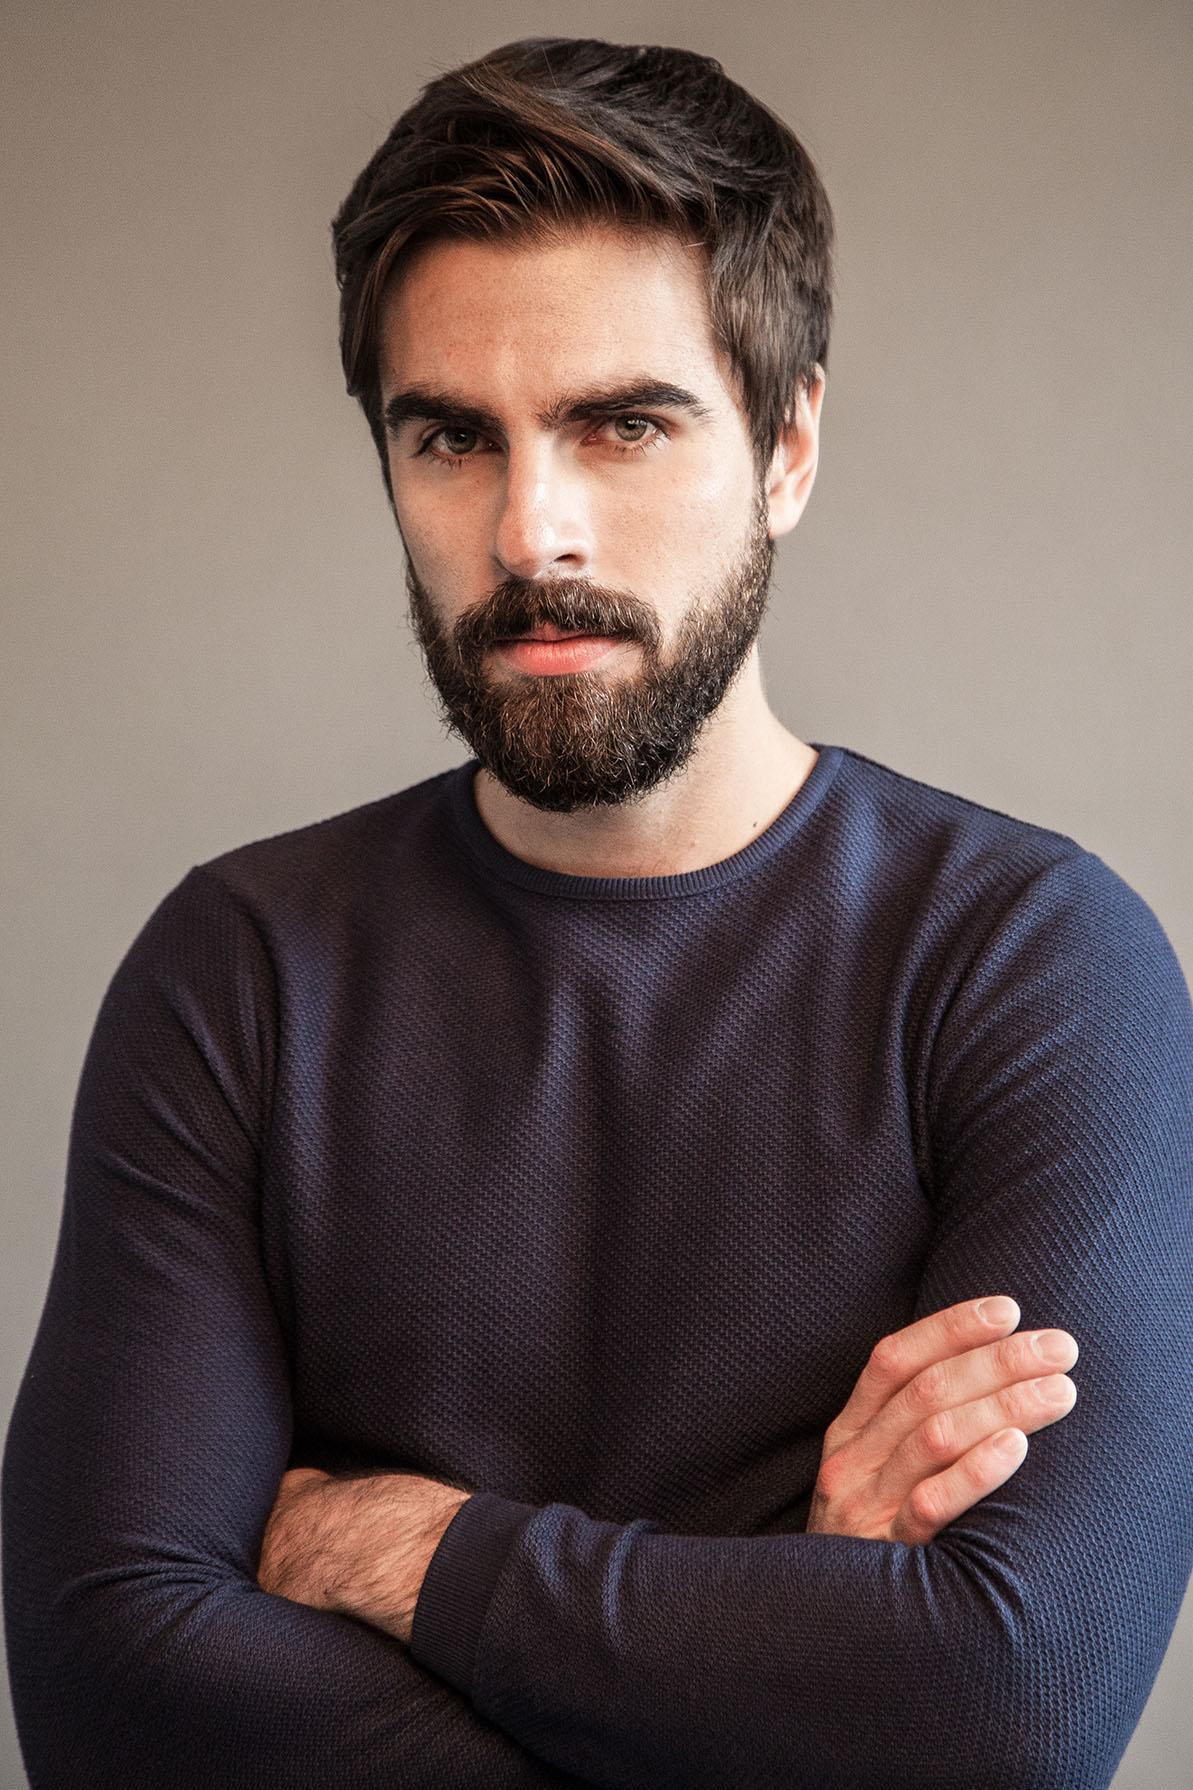 Marco Tostado